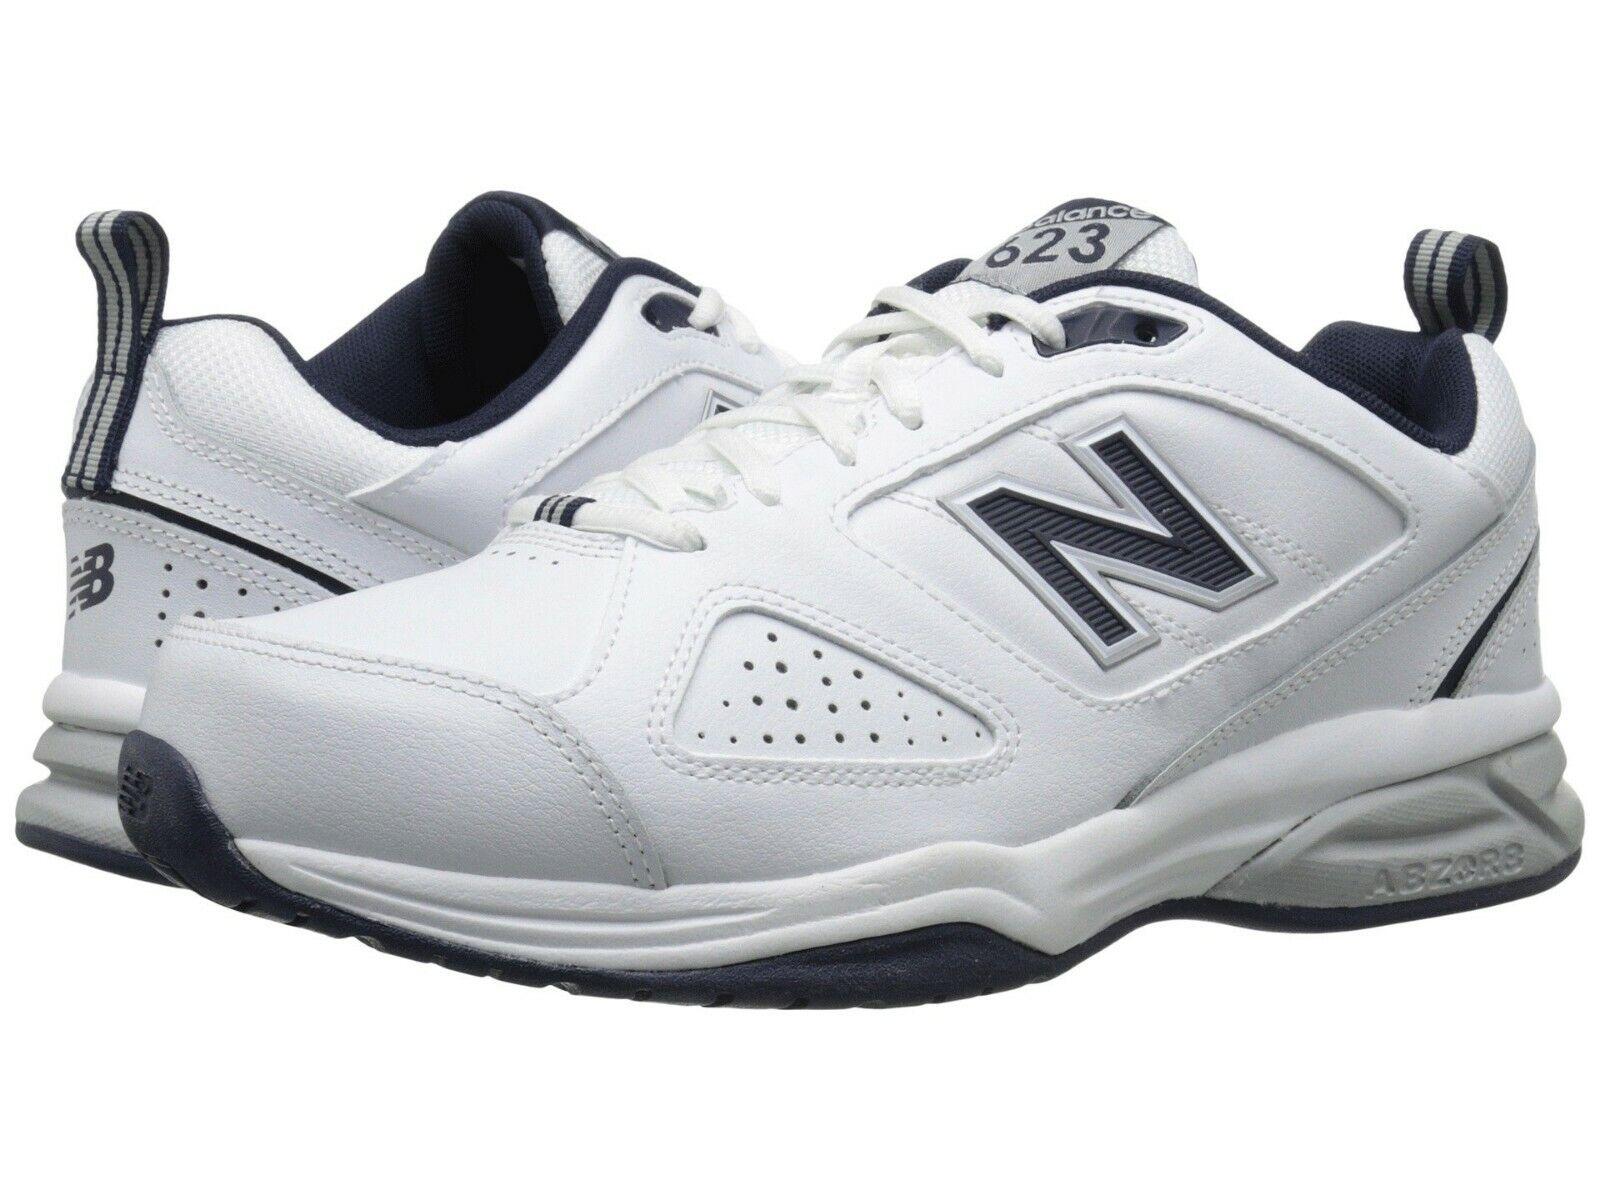 NIB - NEW BALANCE Men's Men's Men's '623v3' White   Navy ATHLETIC TRAINING SHOES - US 10.5 4e9899